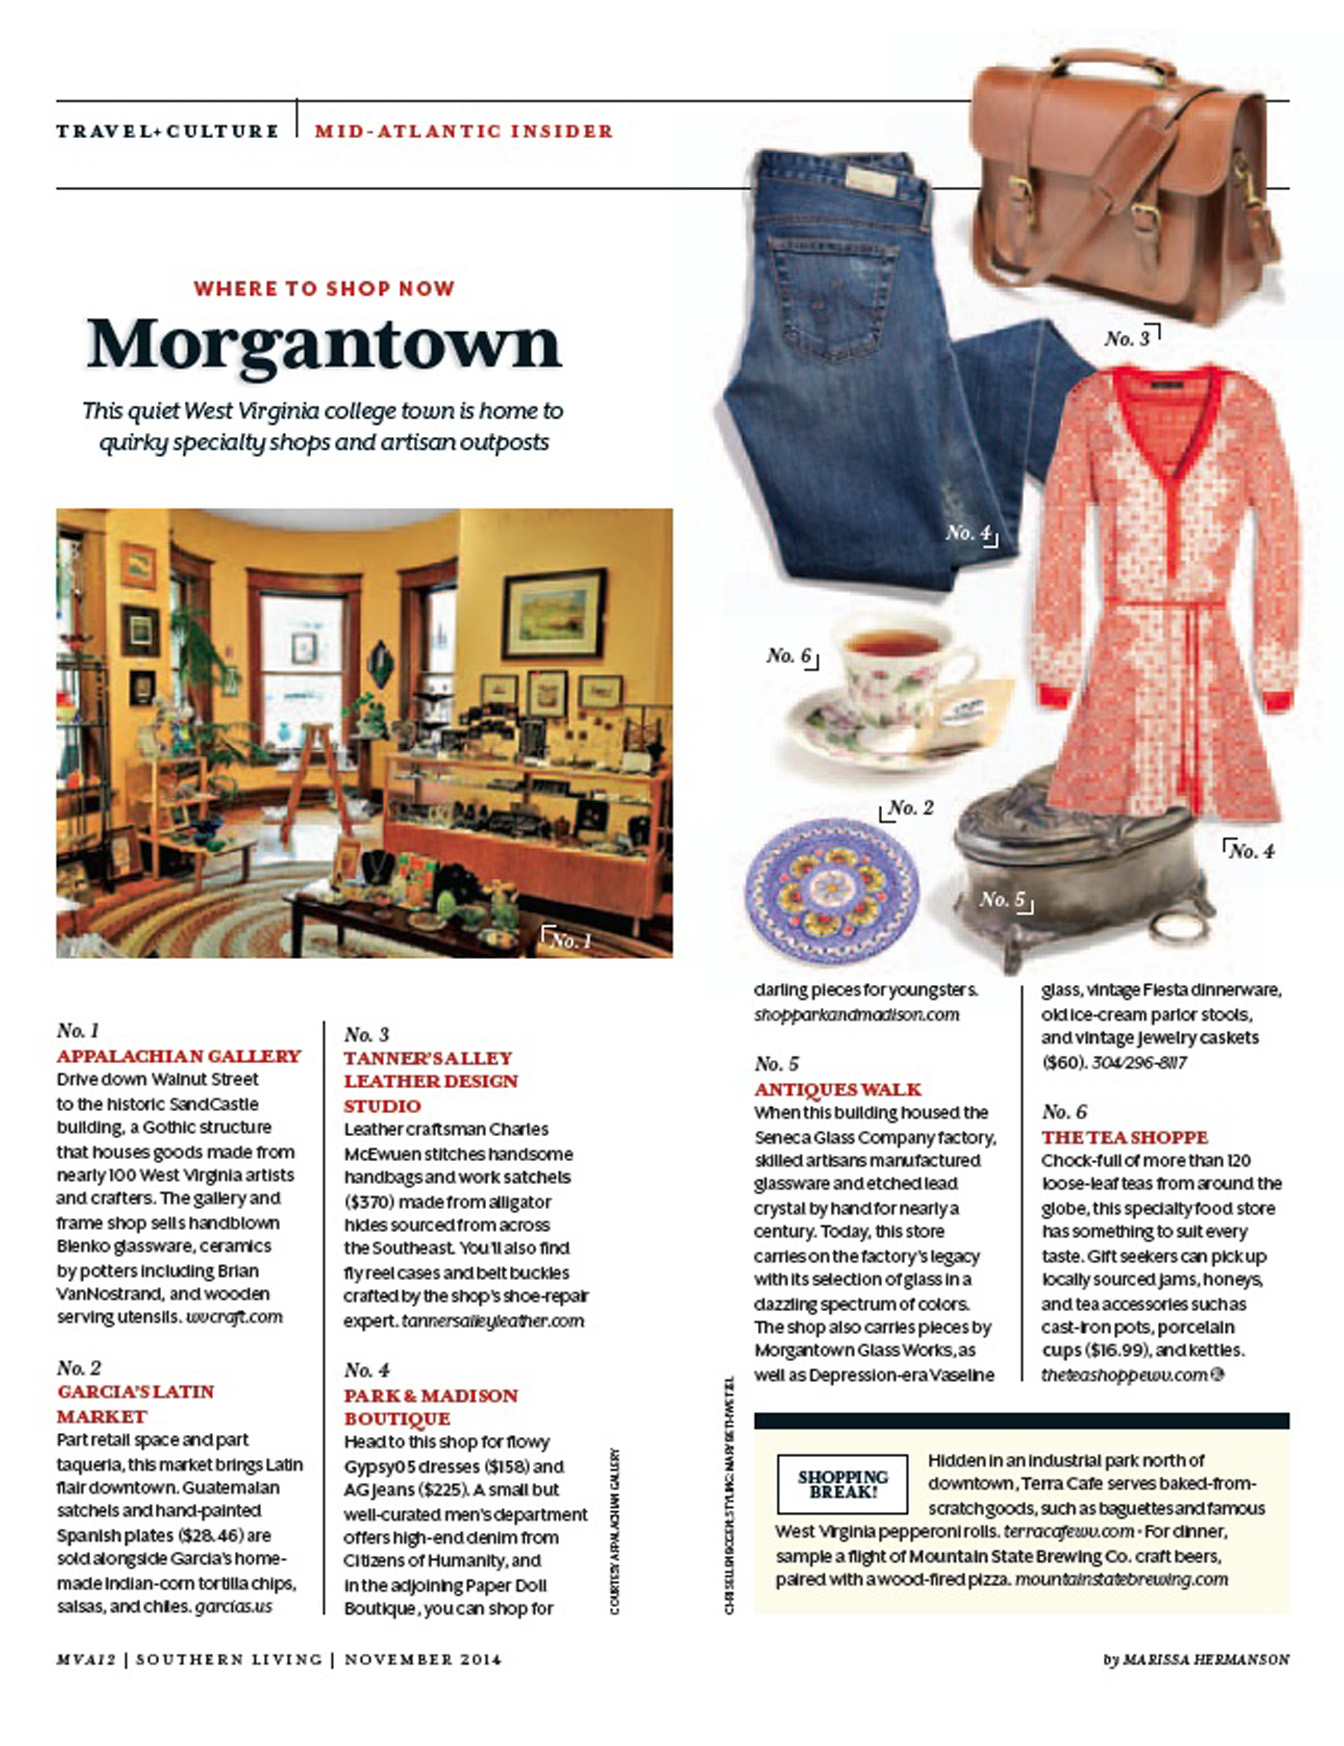 Wtsn morgantown marissa hermanson for Southern living change of address